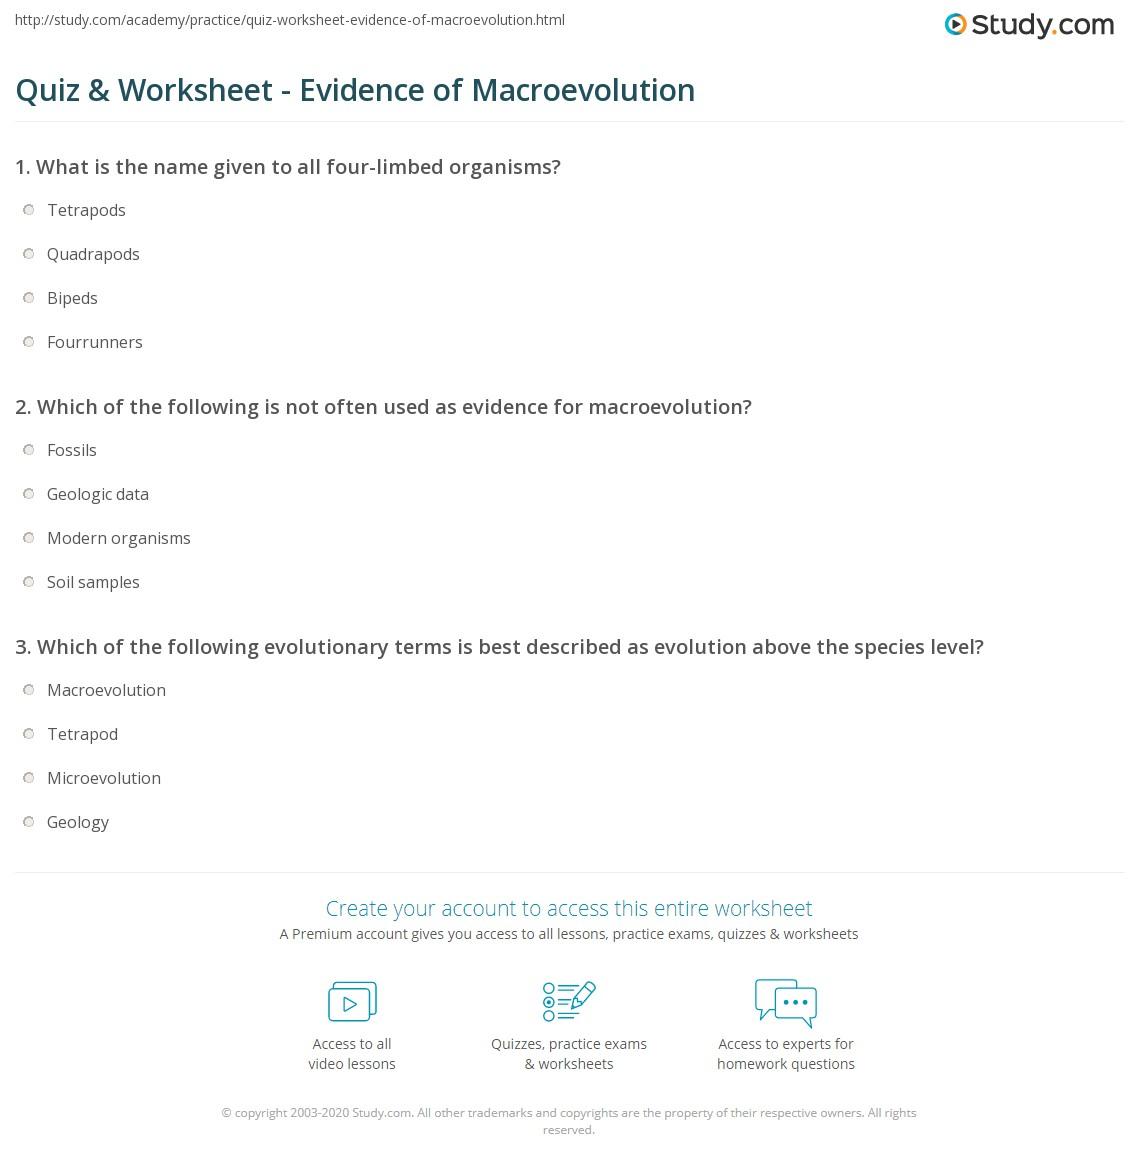 Quiz Worksheet Evidence Of Macroevolution Study